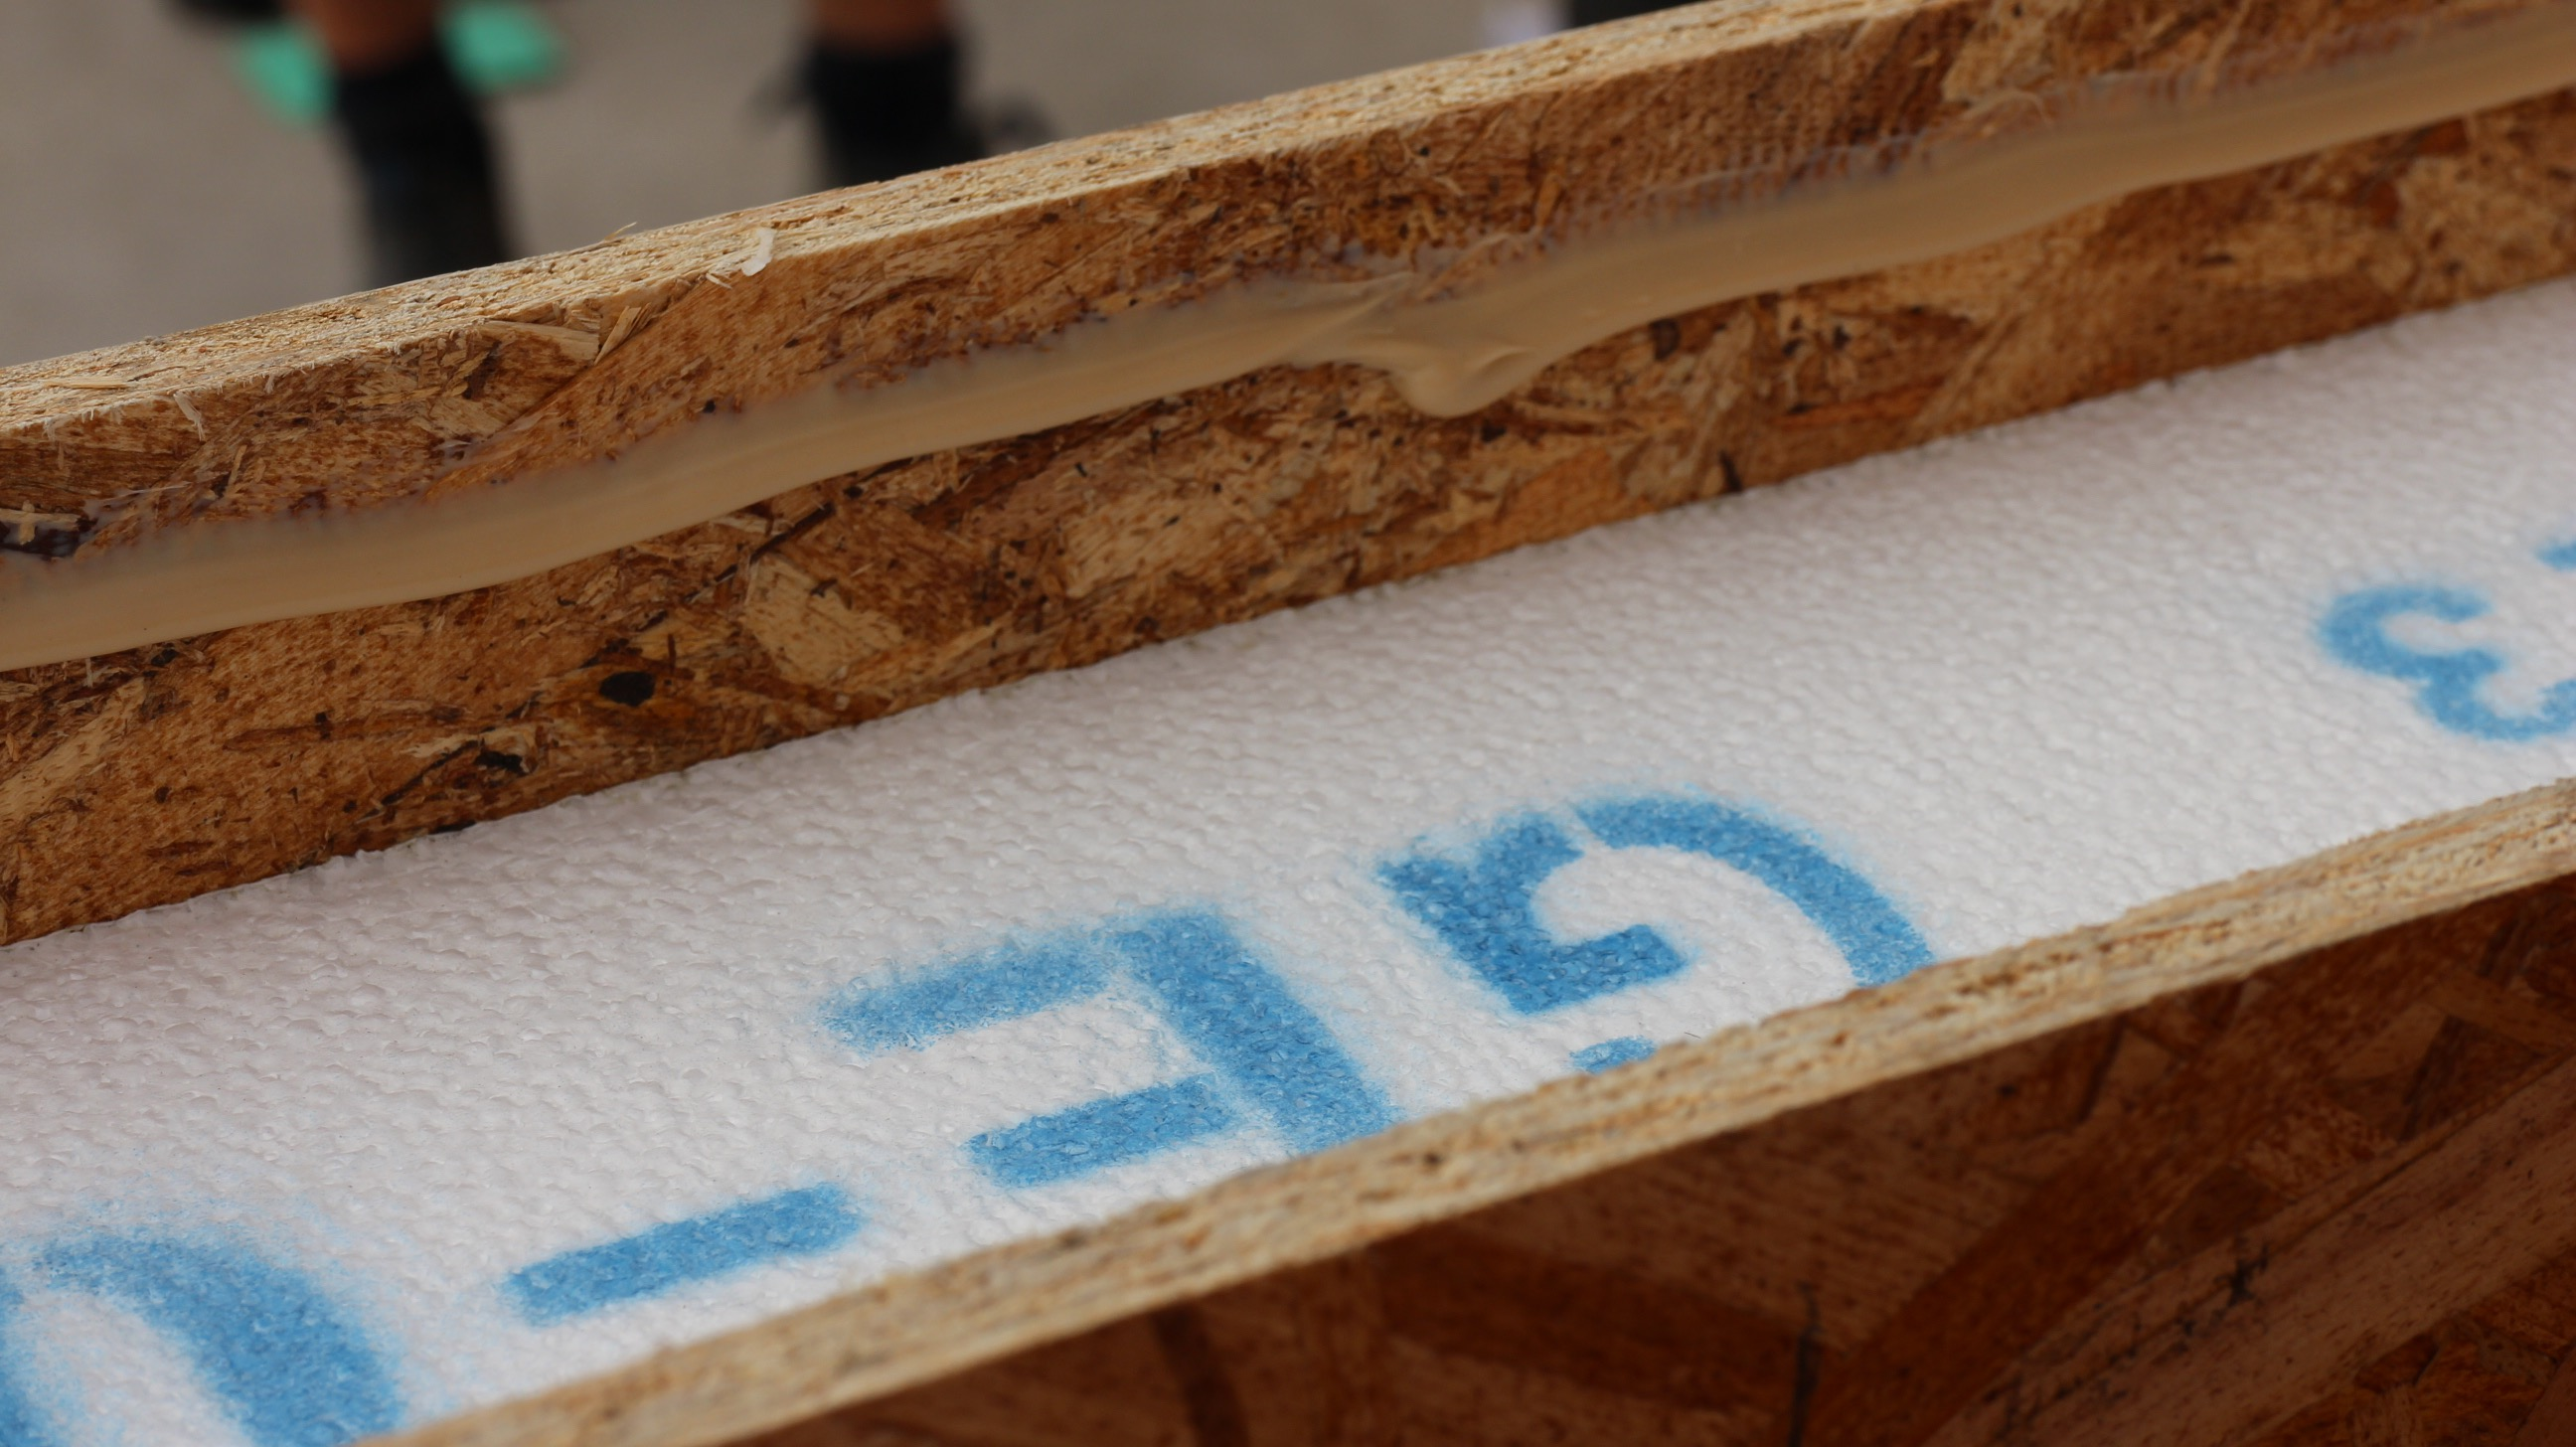 Sealing the panels